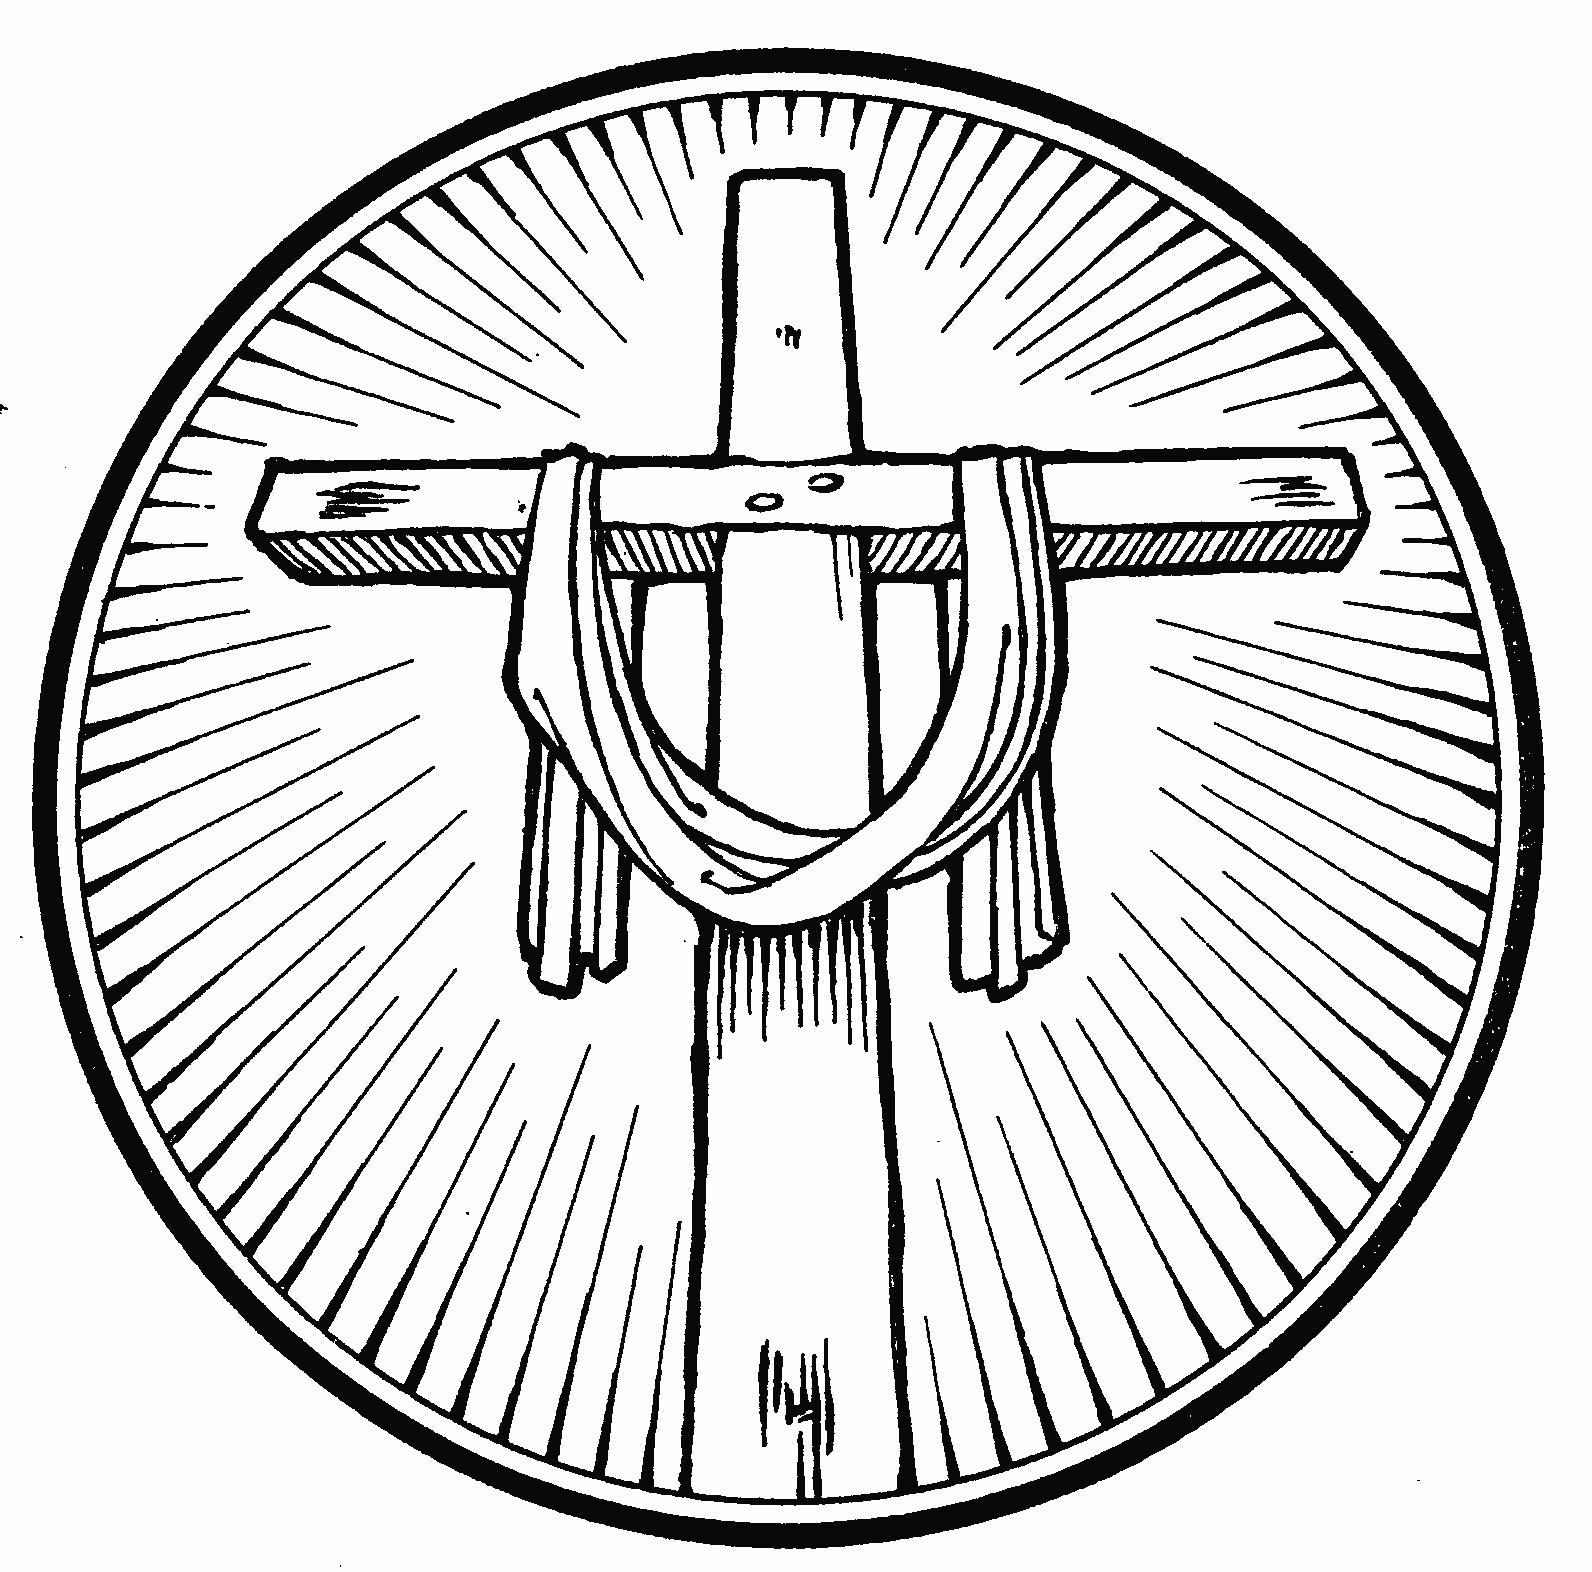 Easter Cross Clipart - ClipArt Best